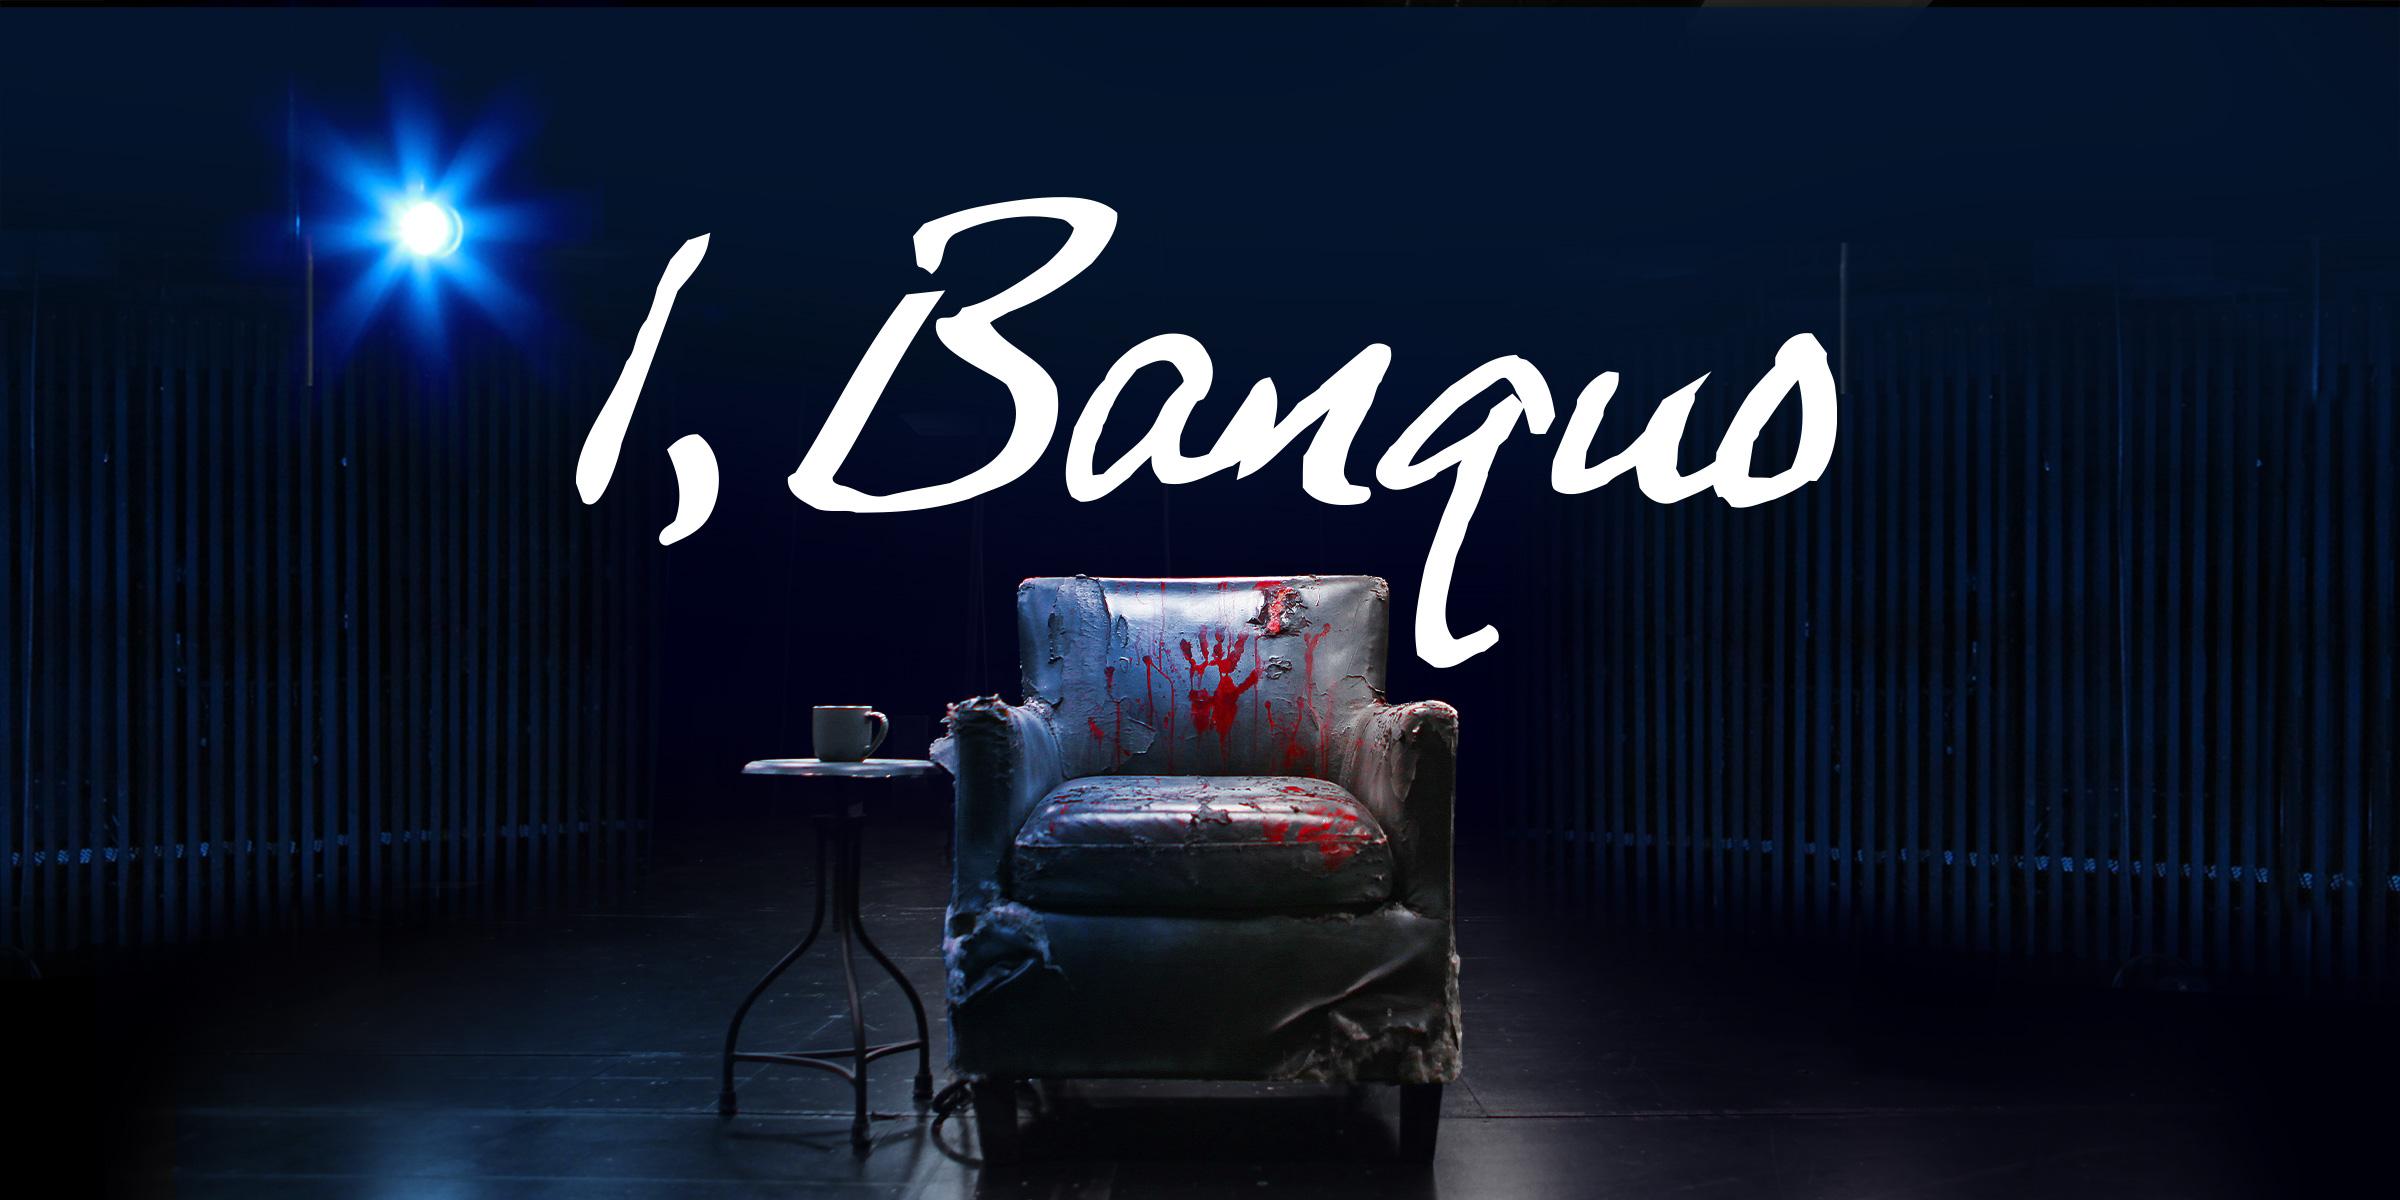 I, Banquo